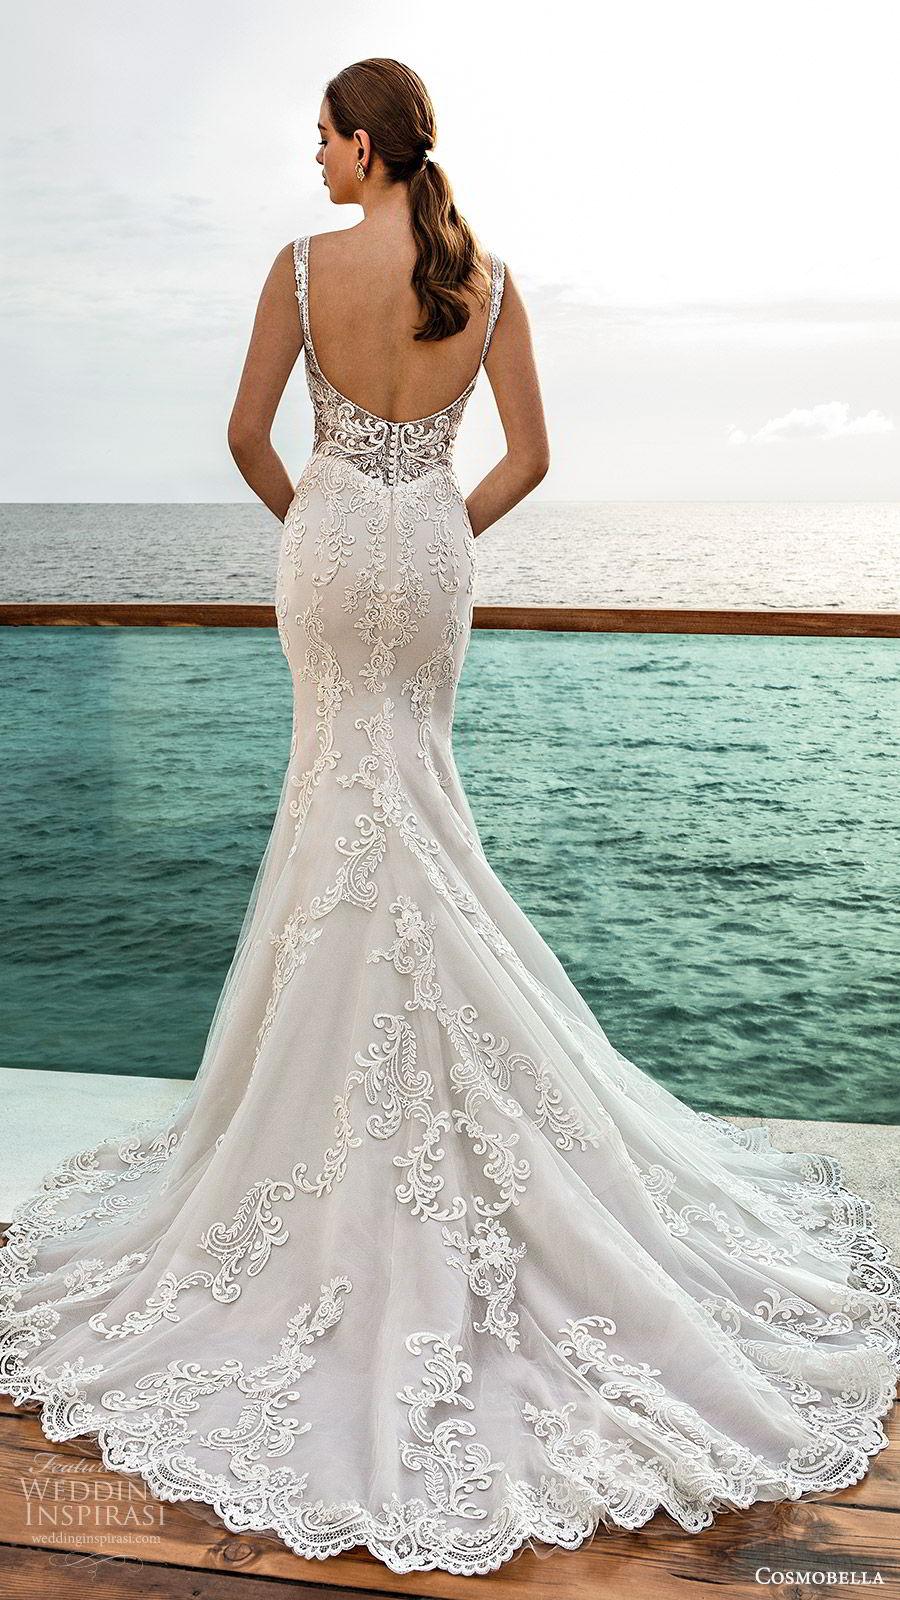 cosmobella 2020 bridal sleeveless v neckline fully embellished lace mermaid sheath wedding dress (3) low illusion back elegant glam chapel train bv